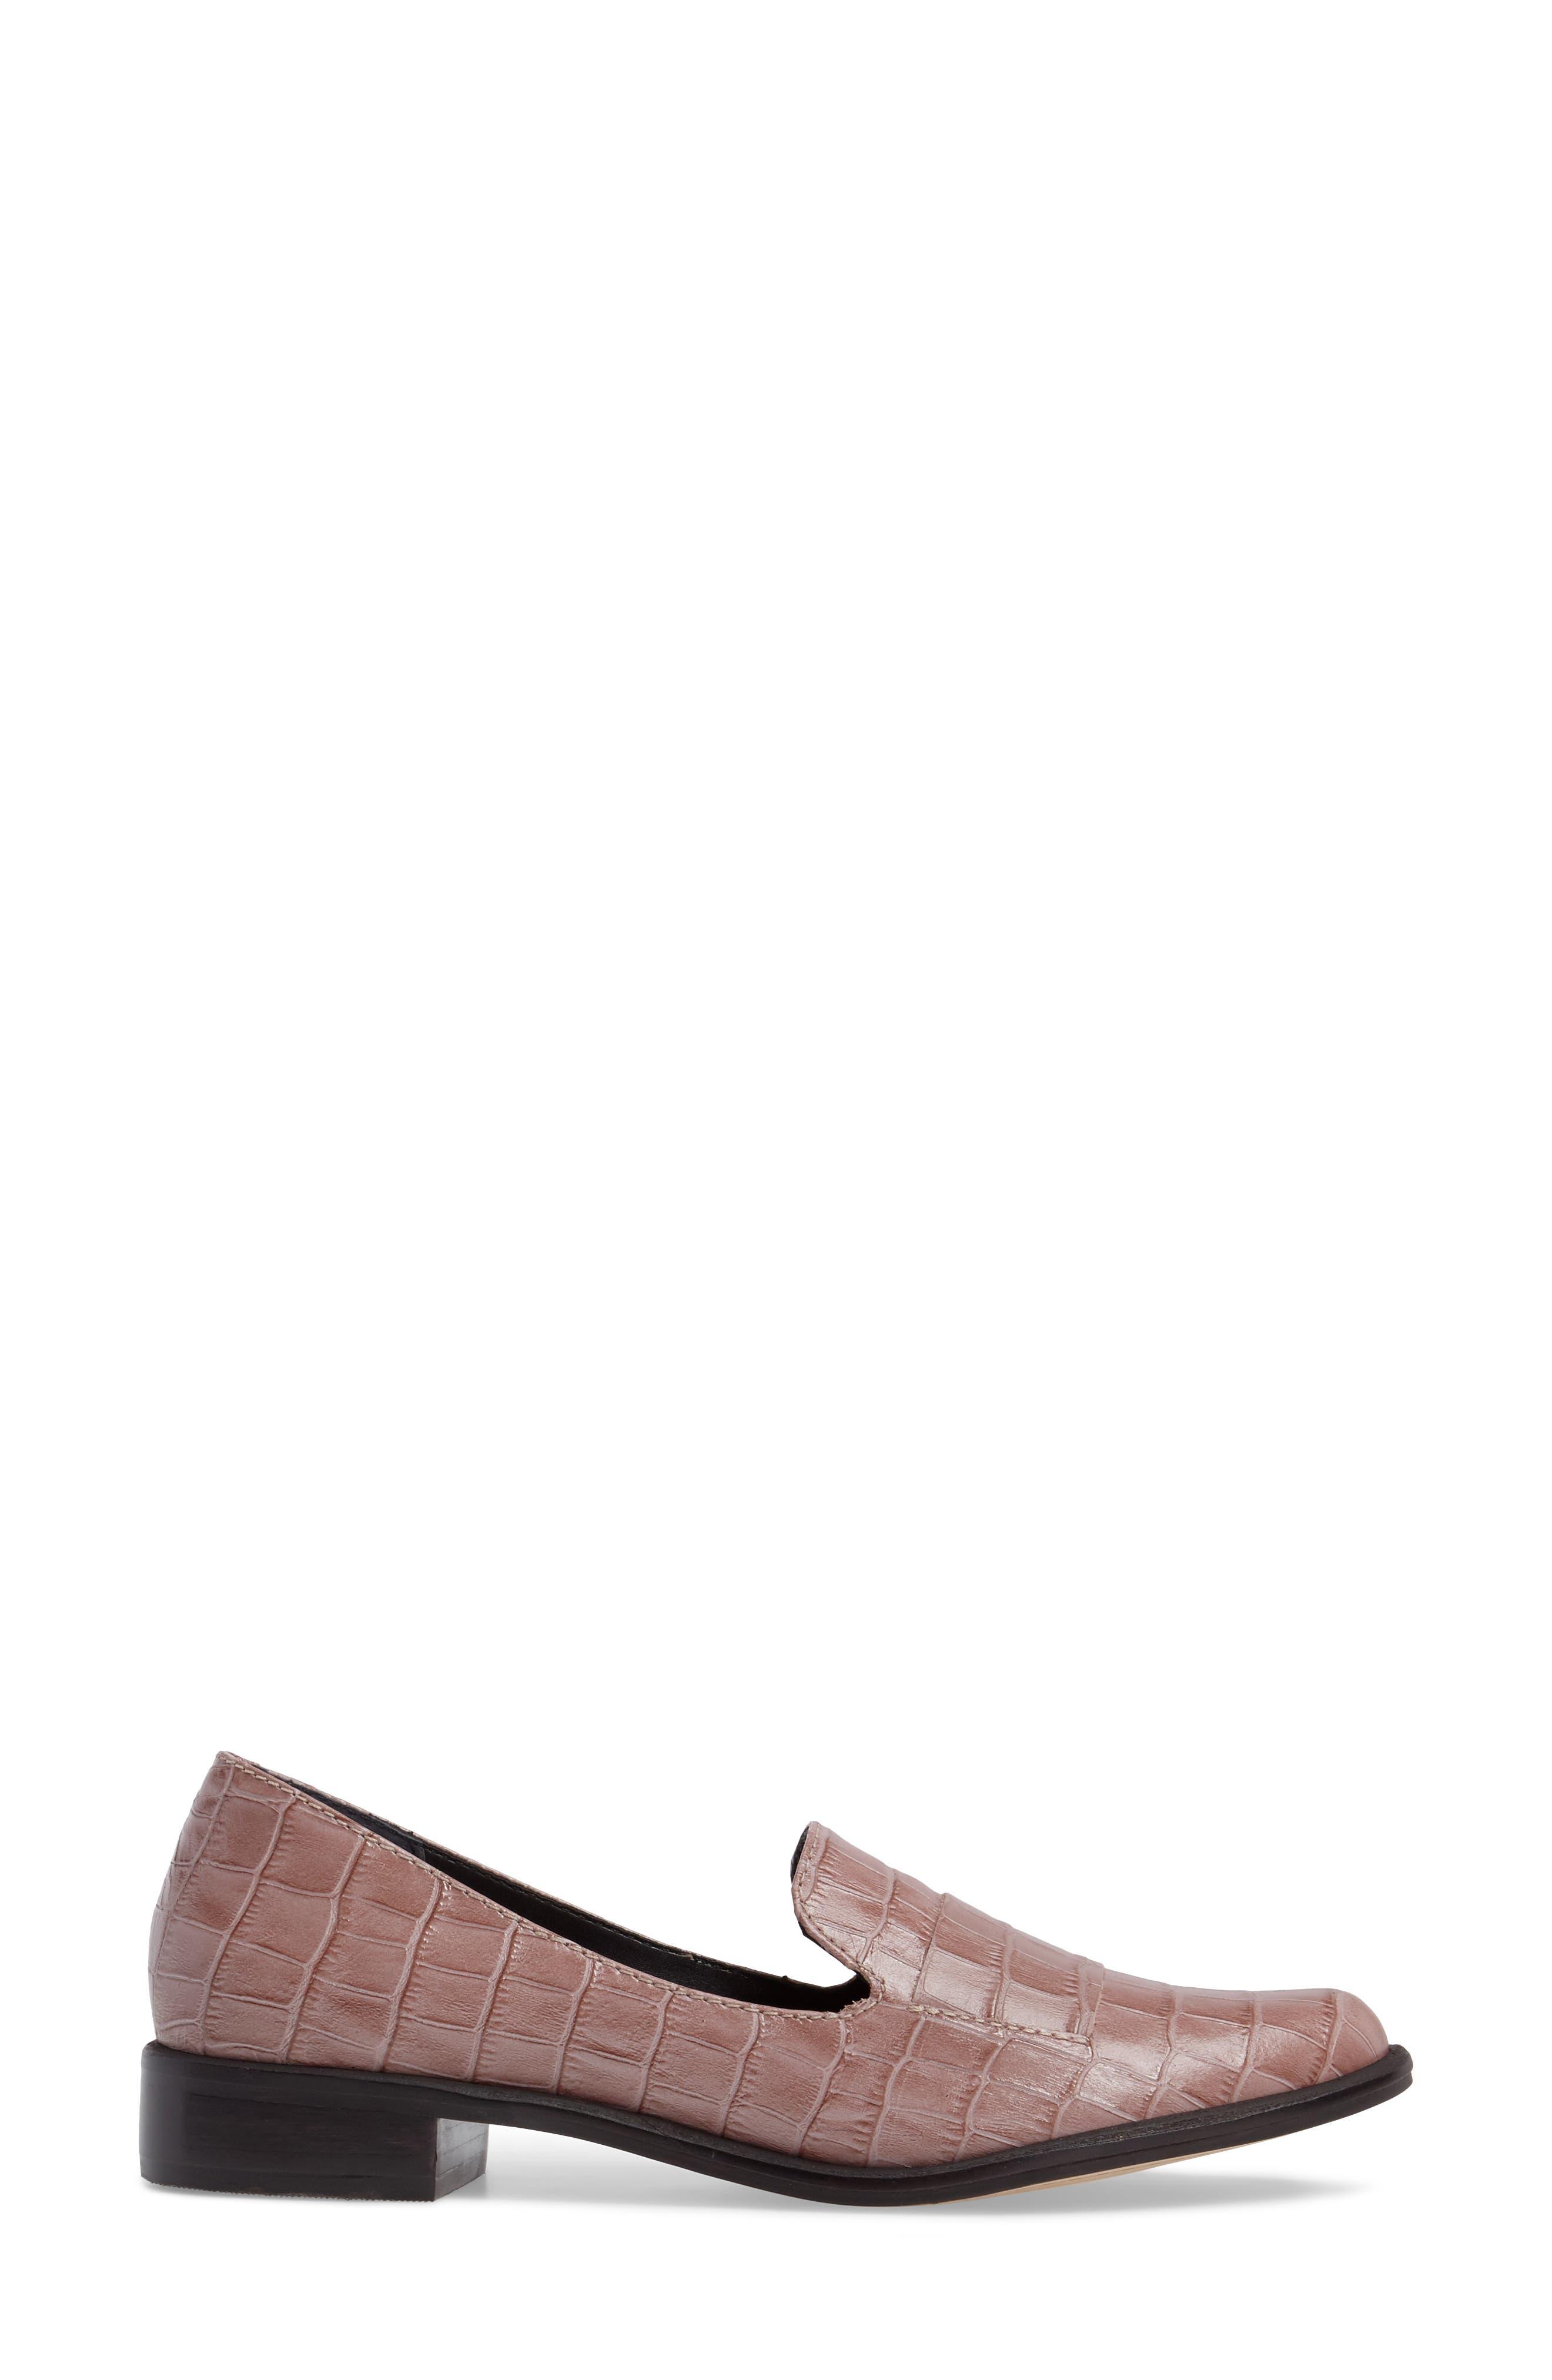 M4D3 'Ocean' Flat Loafer,                             Alternate thumbnail 18, color,